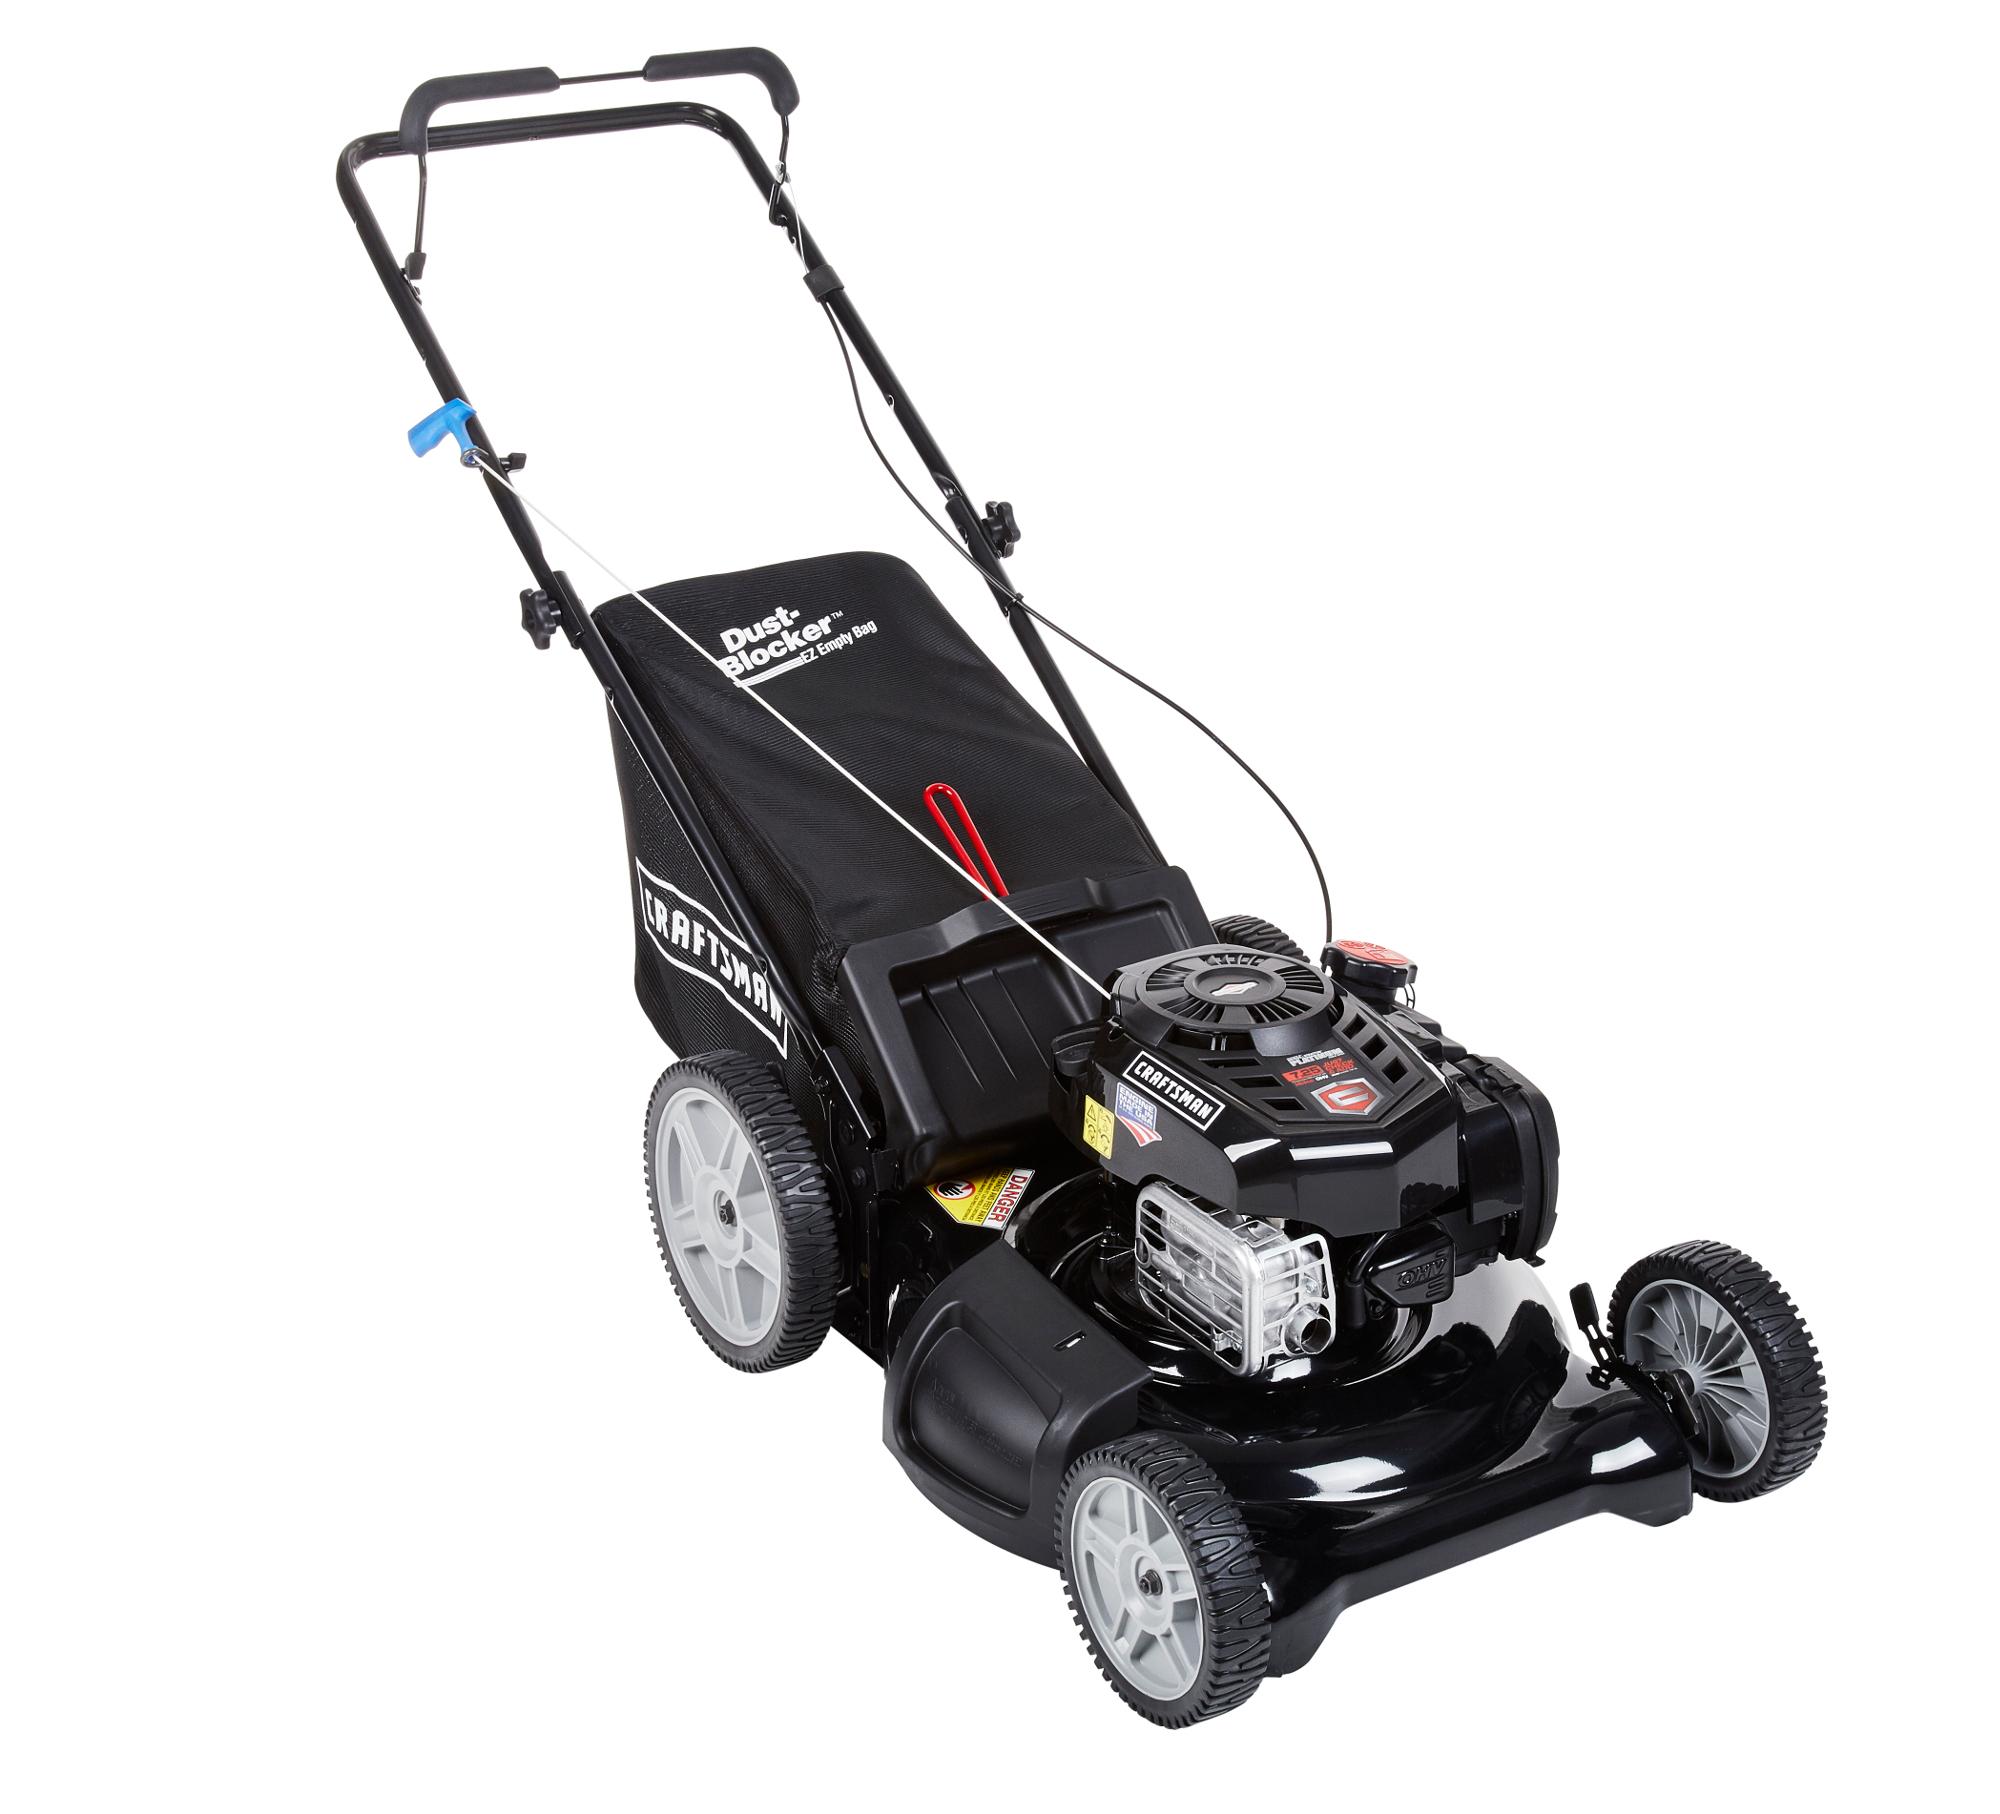 power devil 3.5 hp lawn mower manual